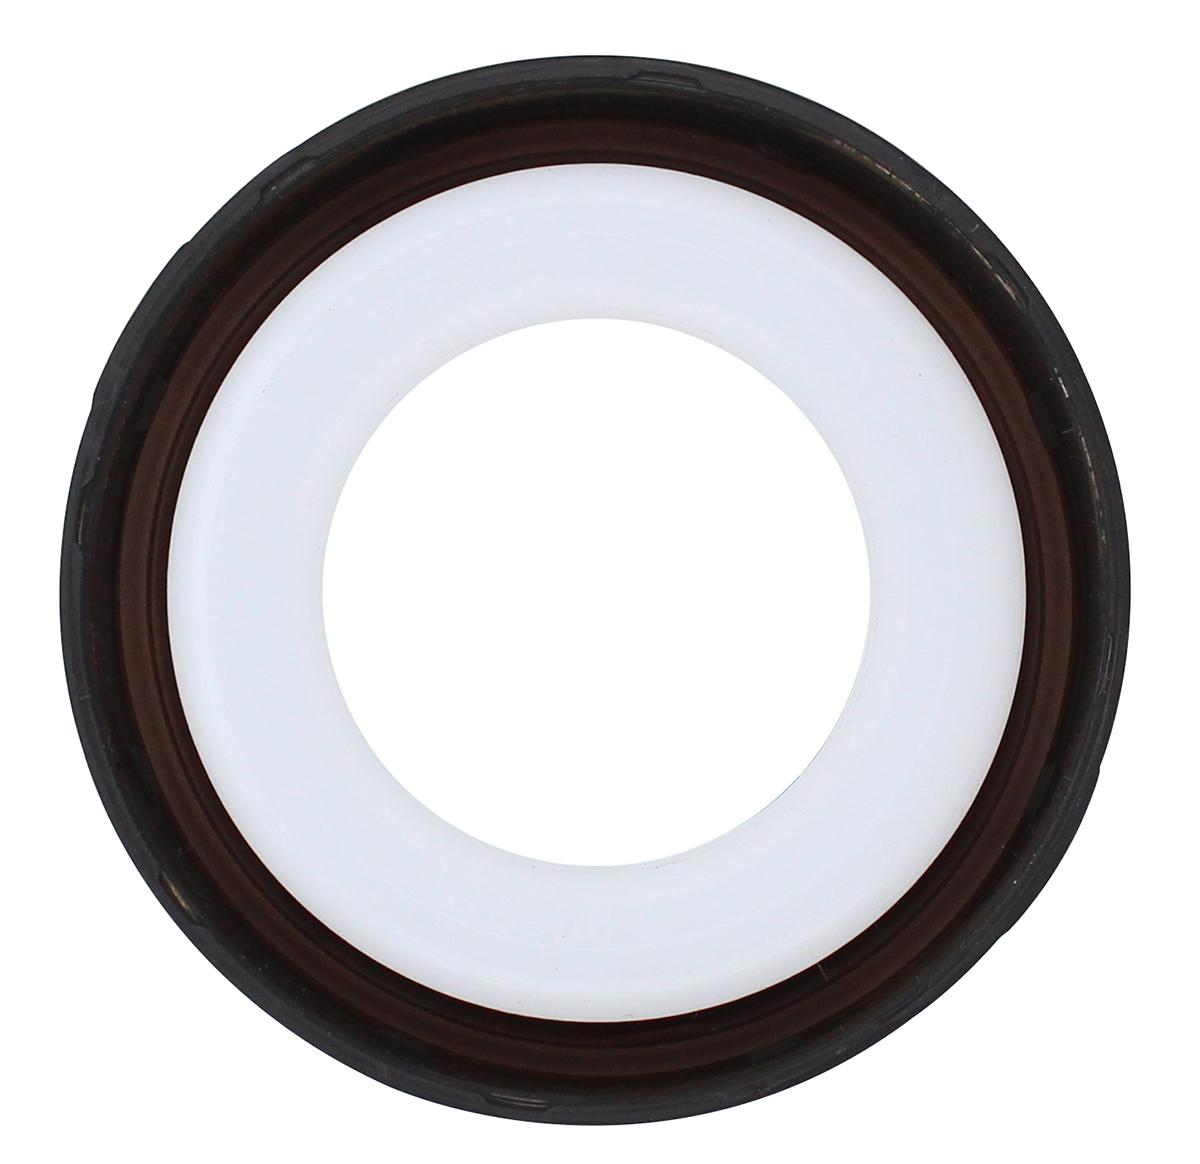 Engine Crankshaft Seal For BMW 128i 135i 325i 535i 740i